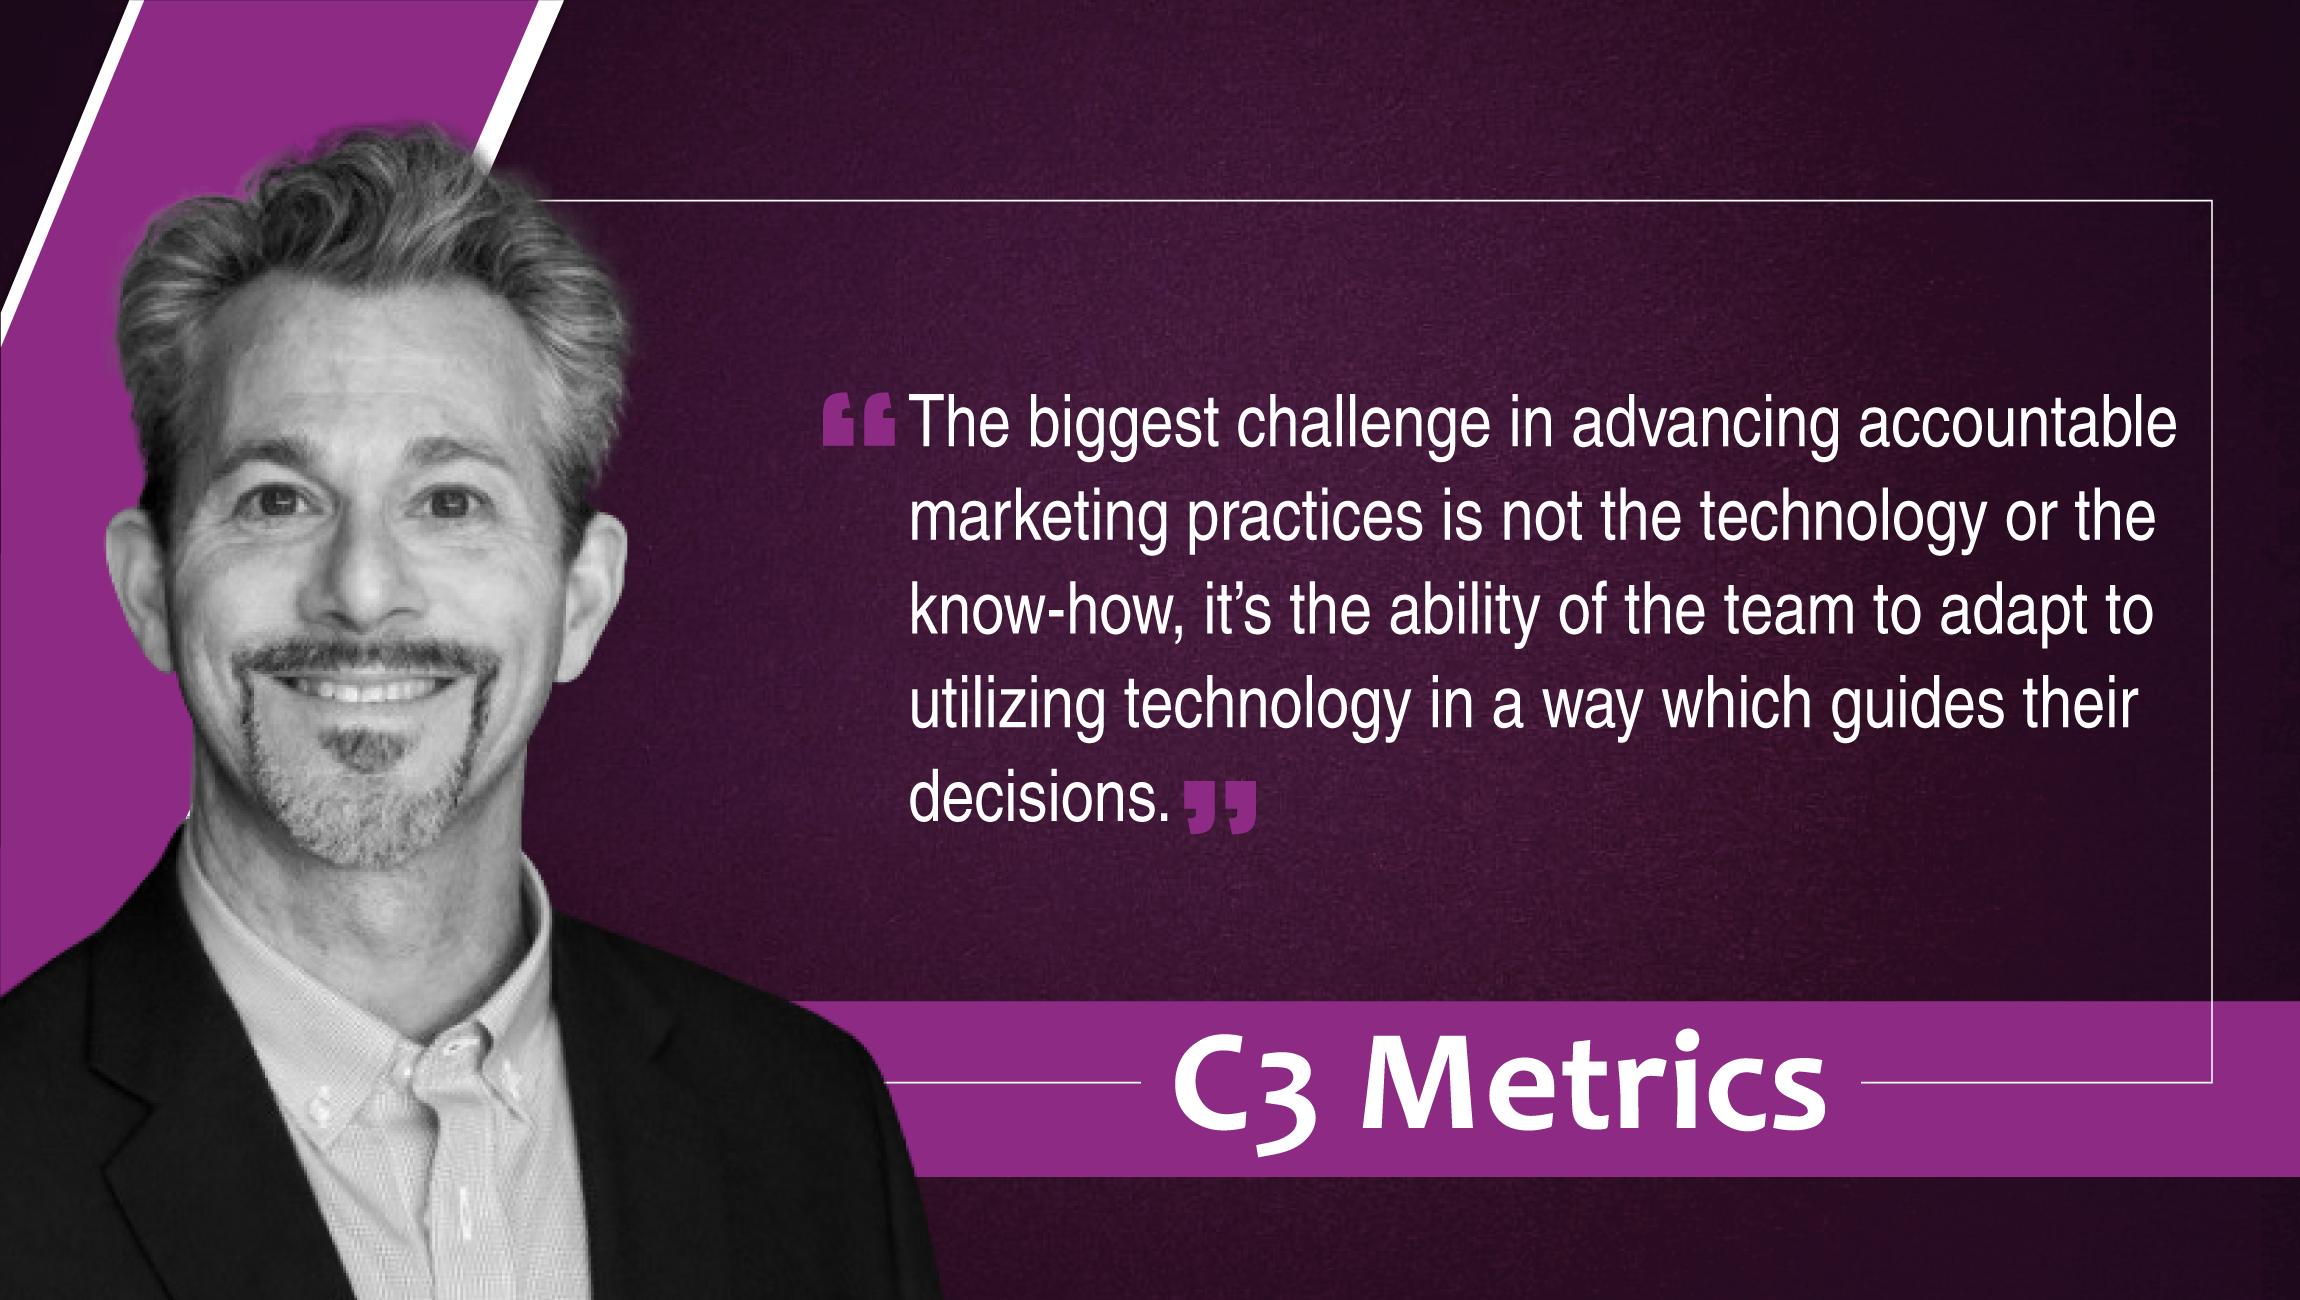 Jeff Greenfield, COO, C3 Metrics